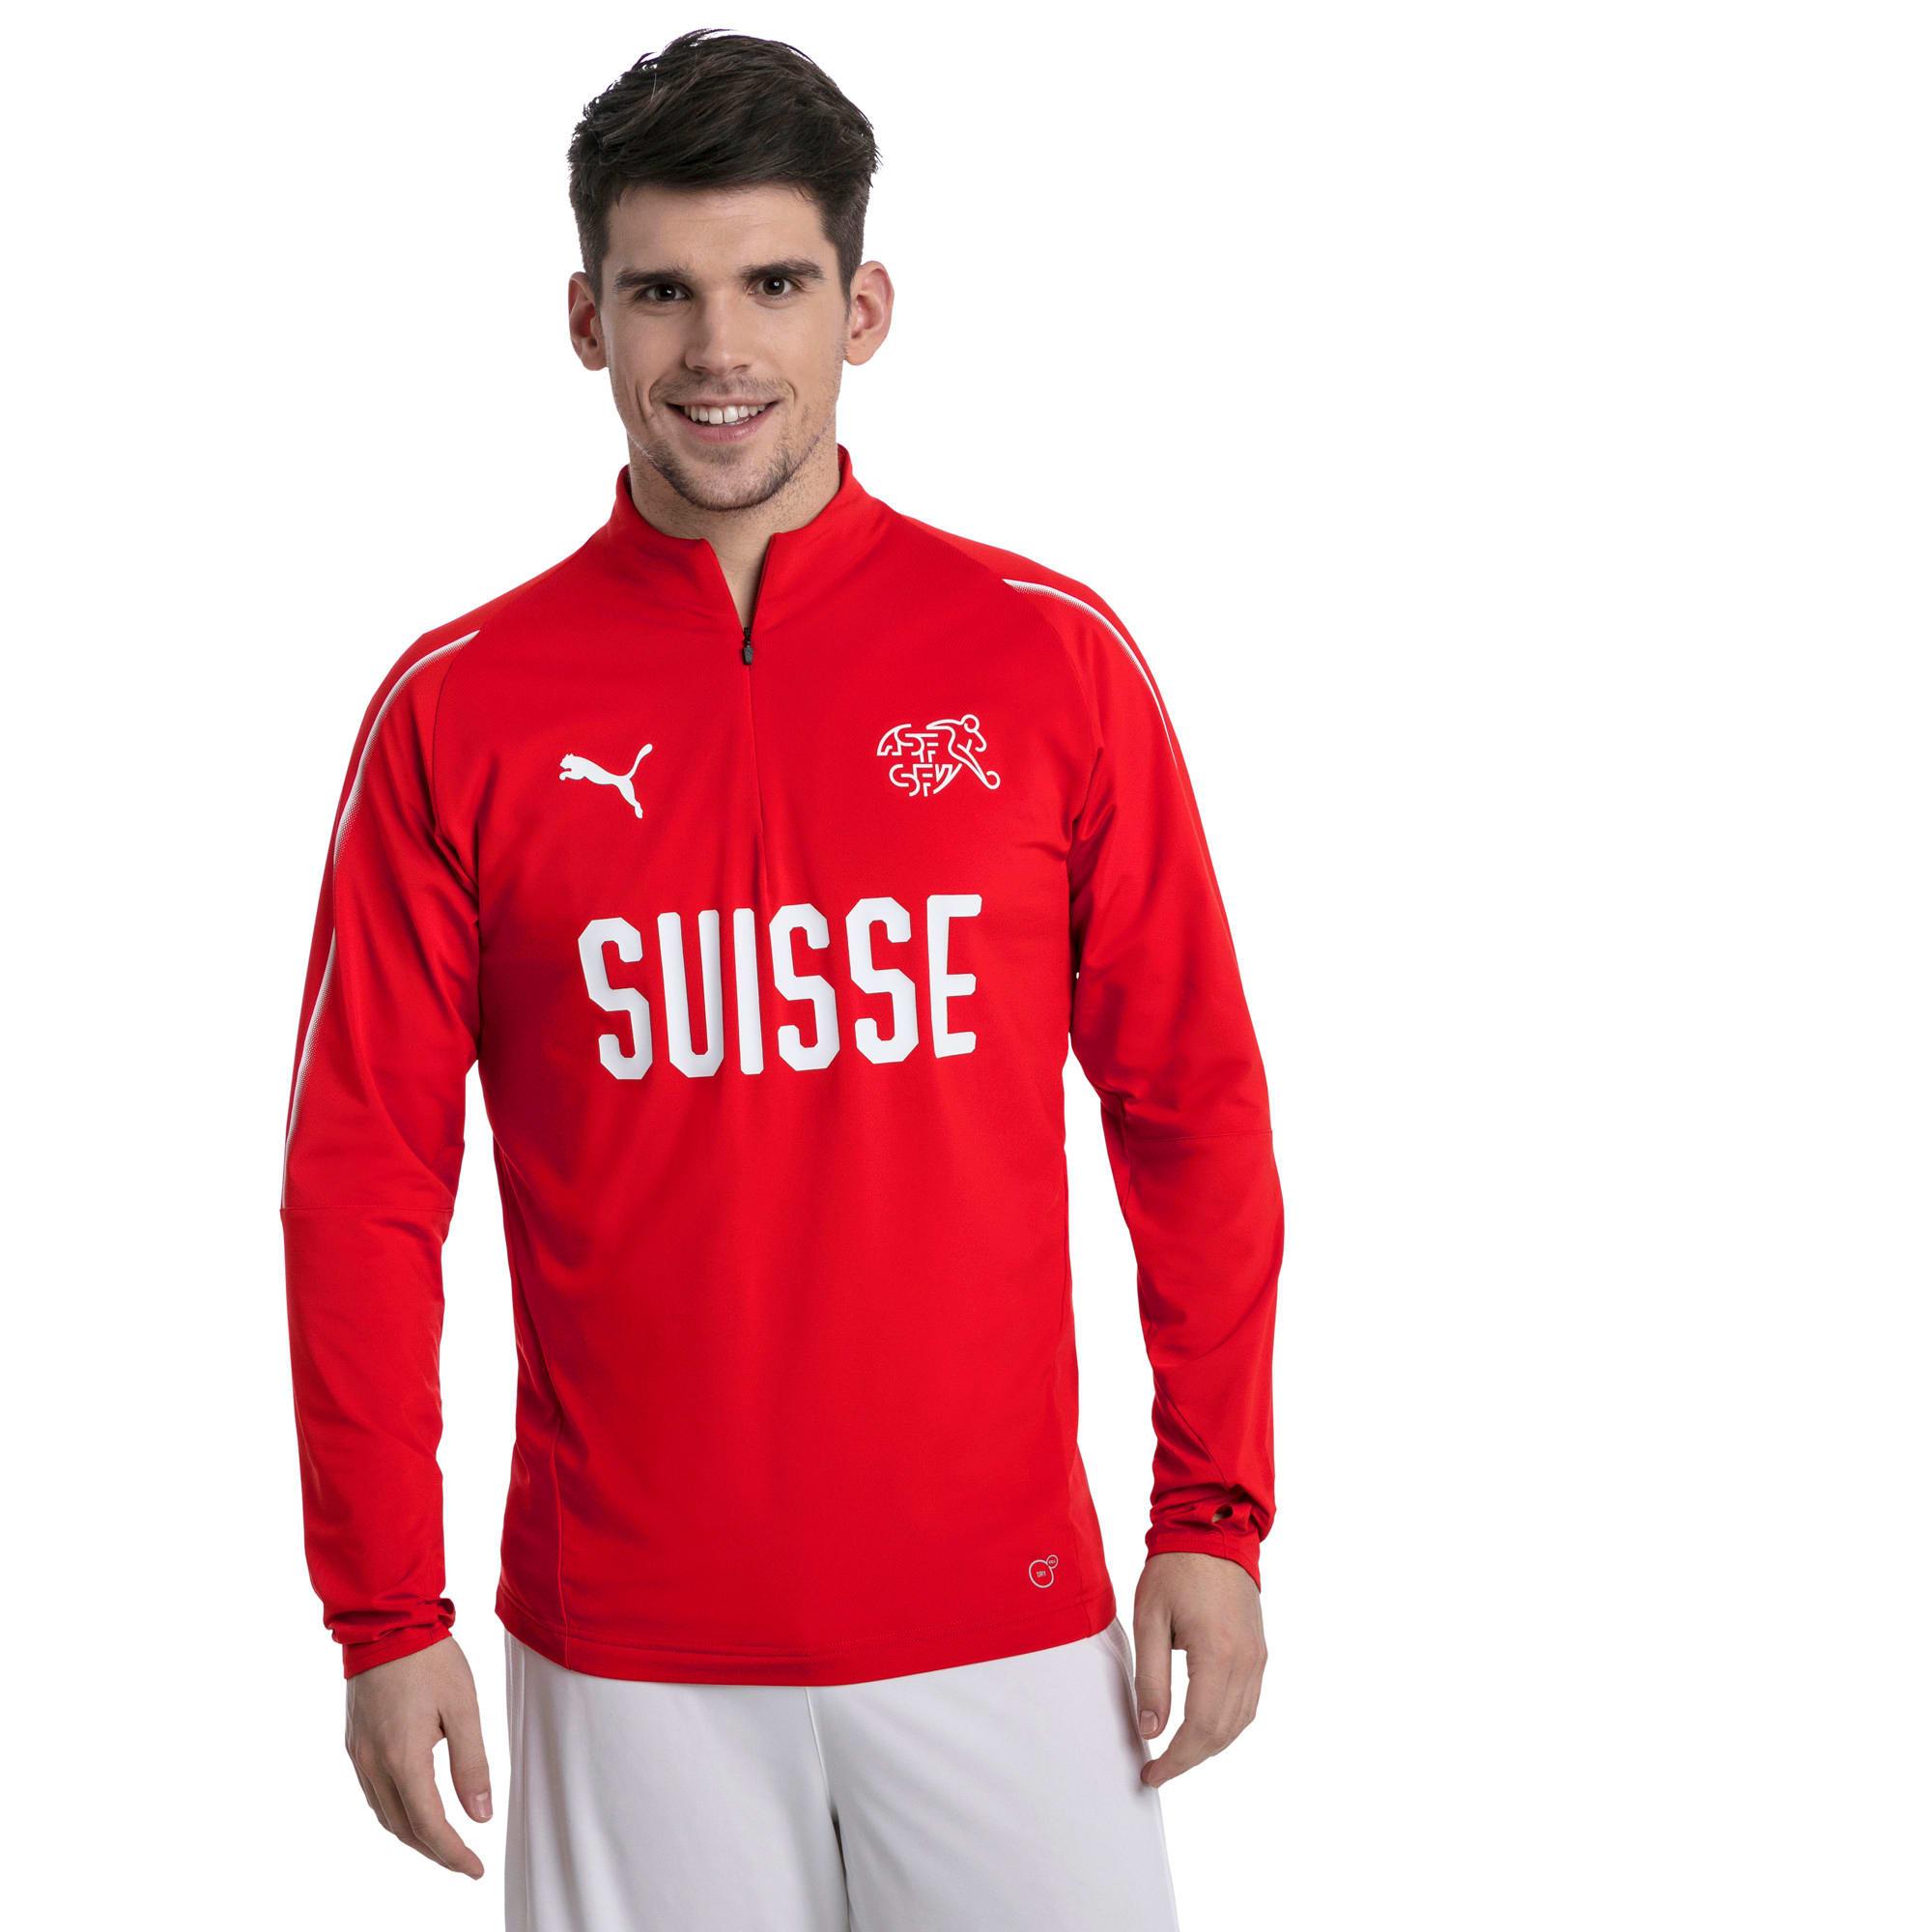 Thumbnail 2 of Trainingstop van Zwitserland met korte rits, Puma Red-Puma White, medium